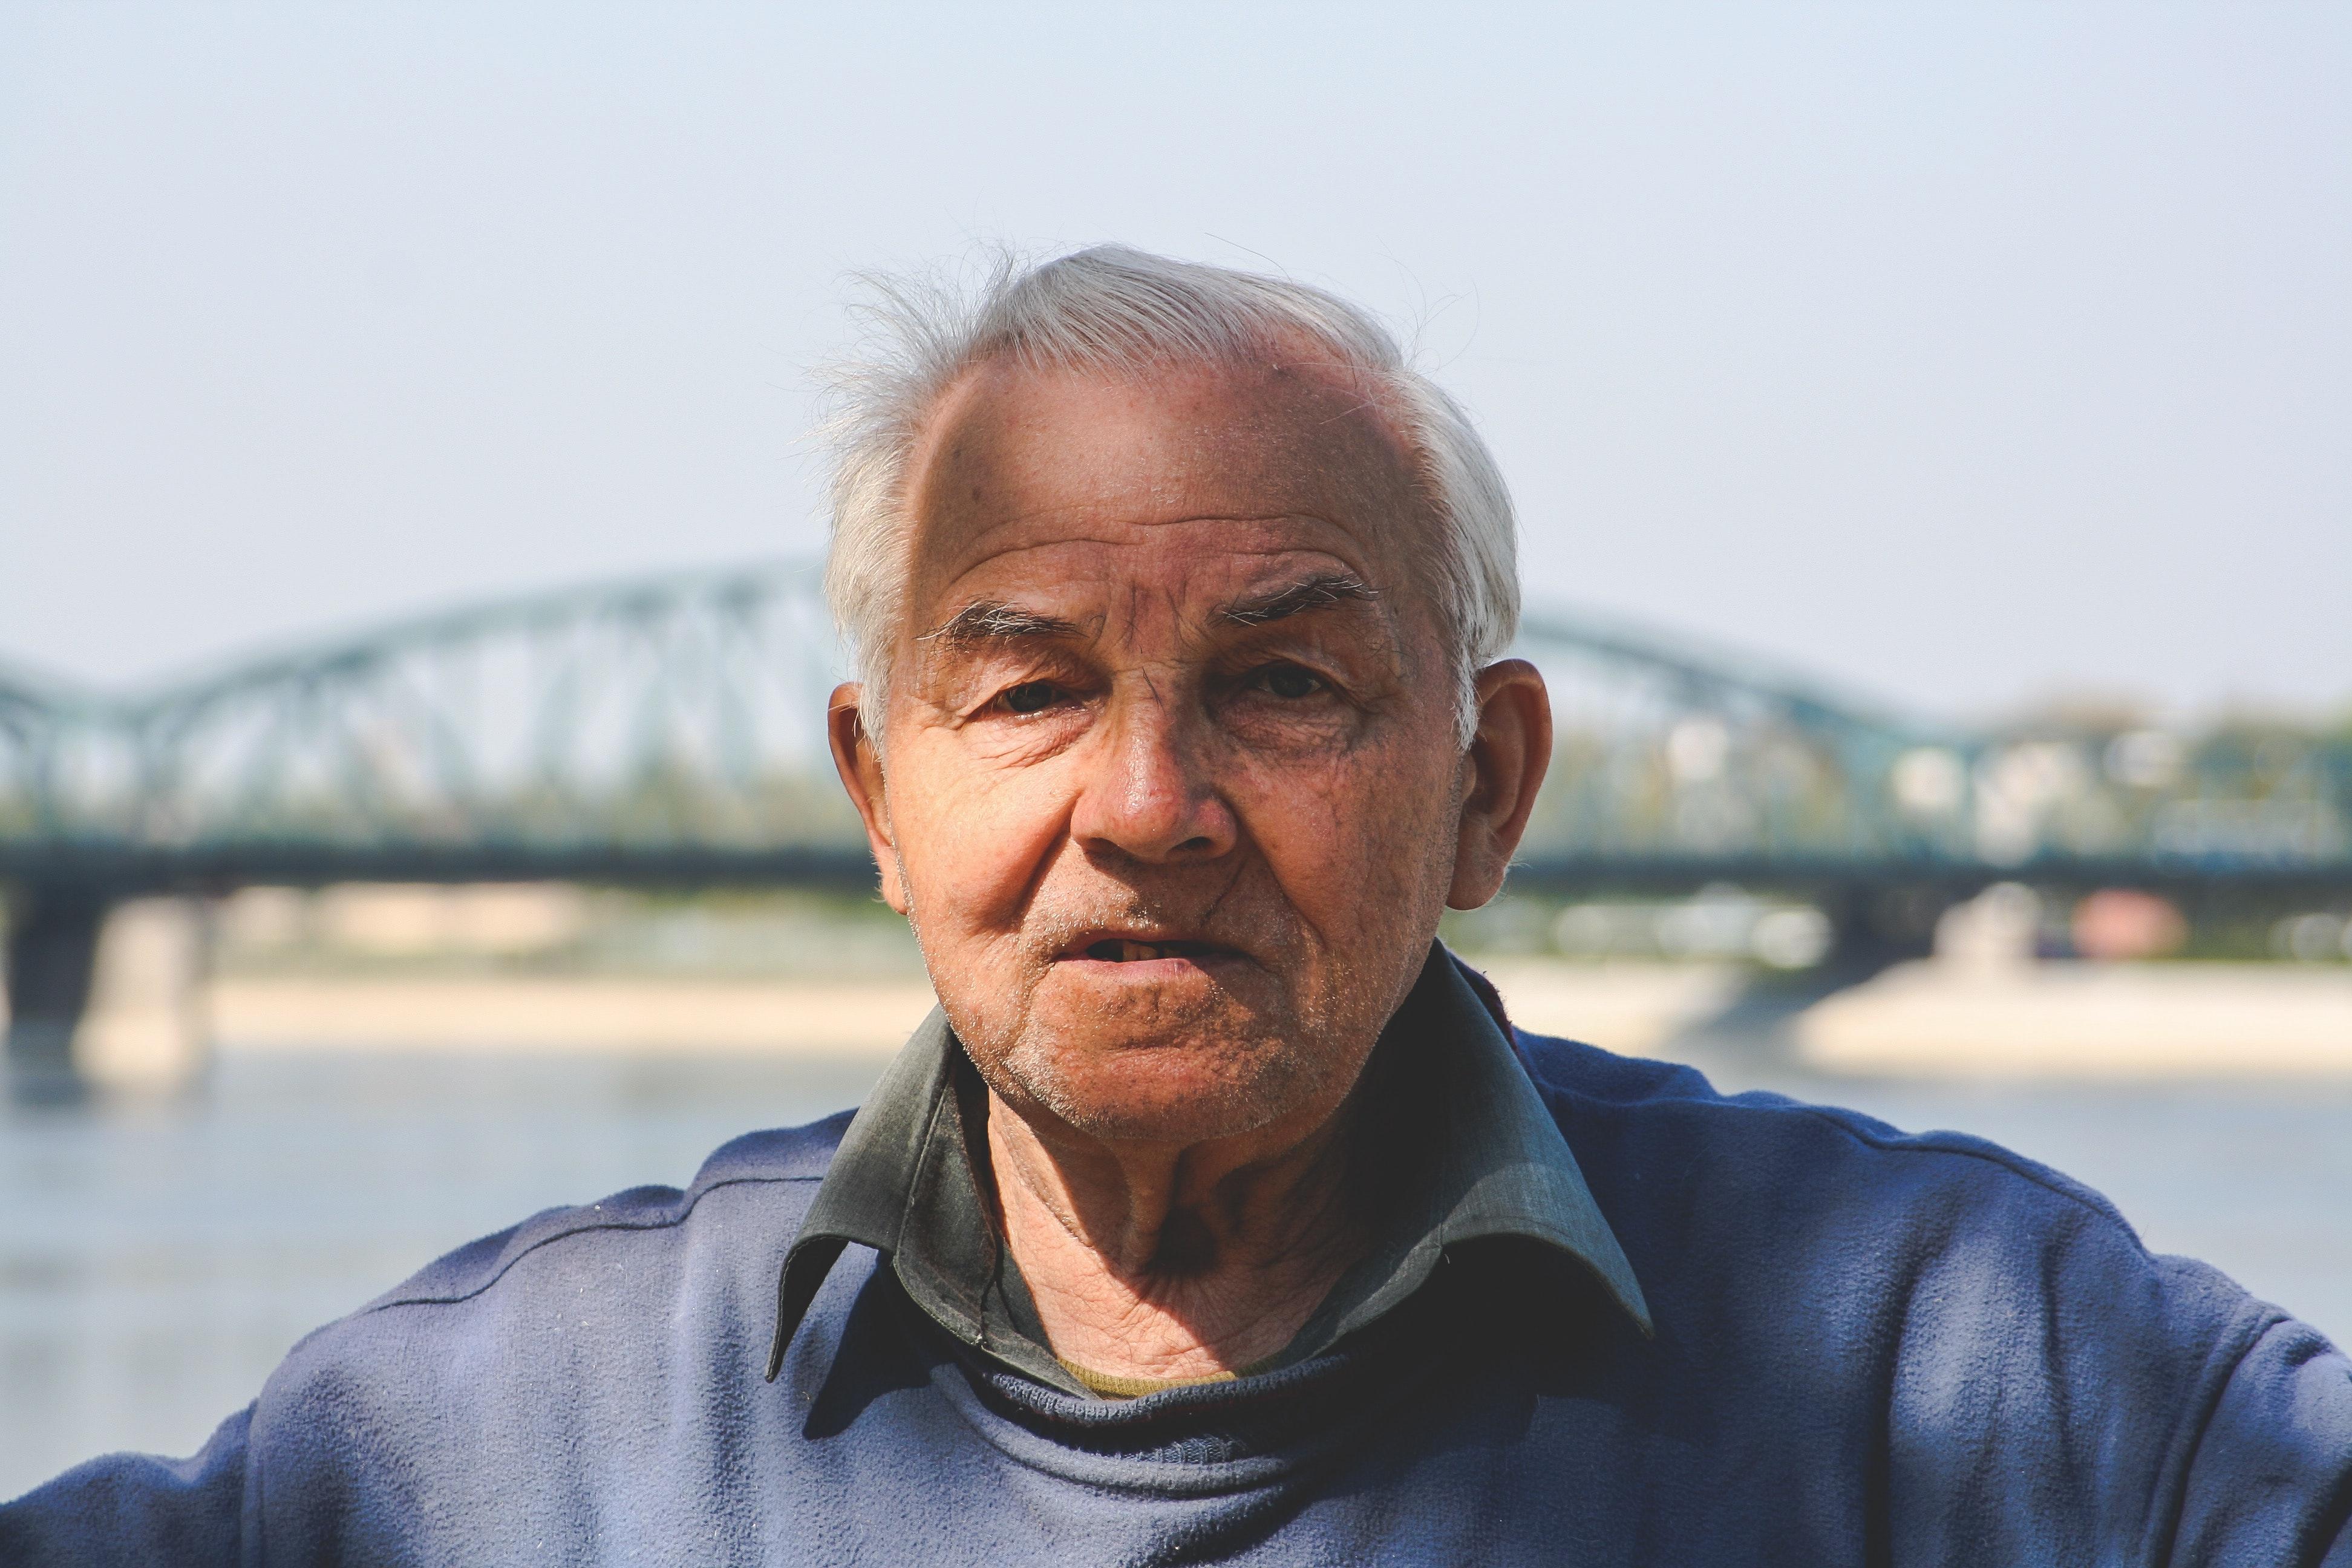 Diego Chiraulo